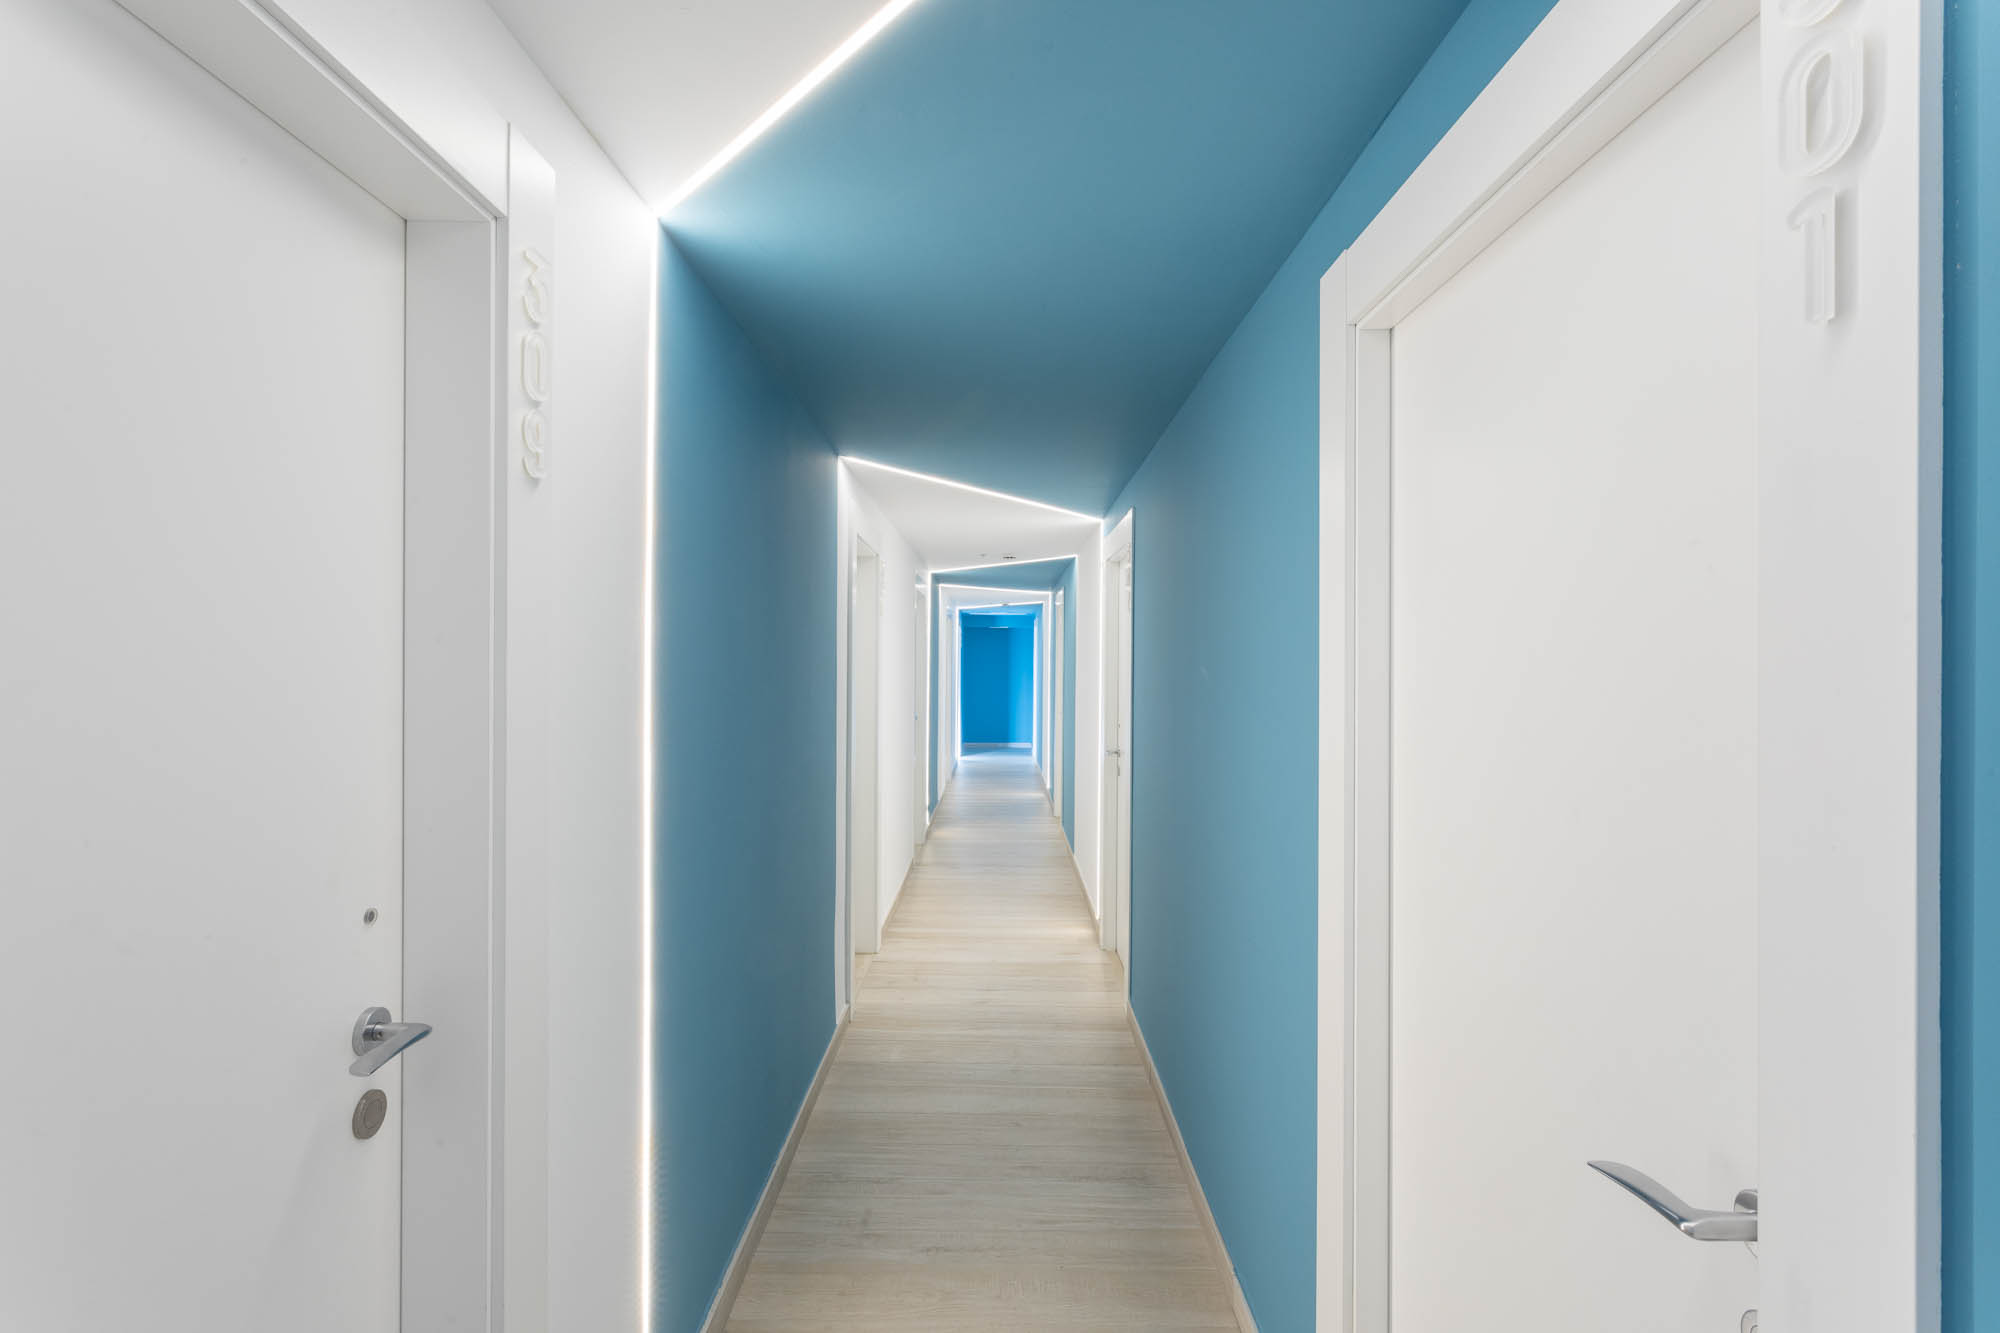 Pasillo HOTEL ROCATEL diseño por ROSA COLET INTERIOR DESIGN